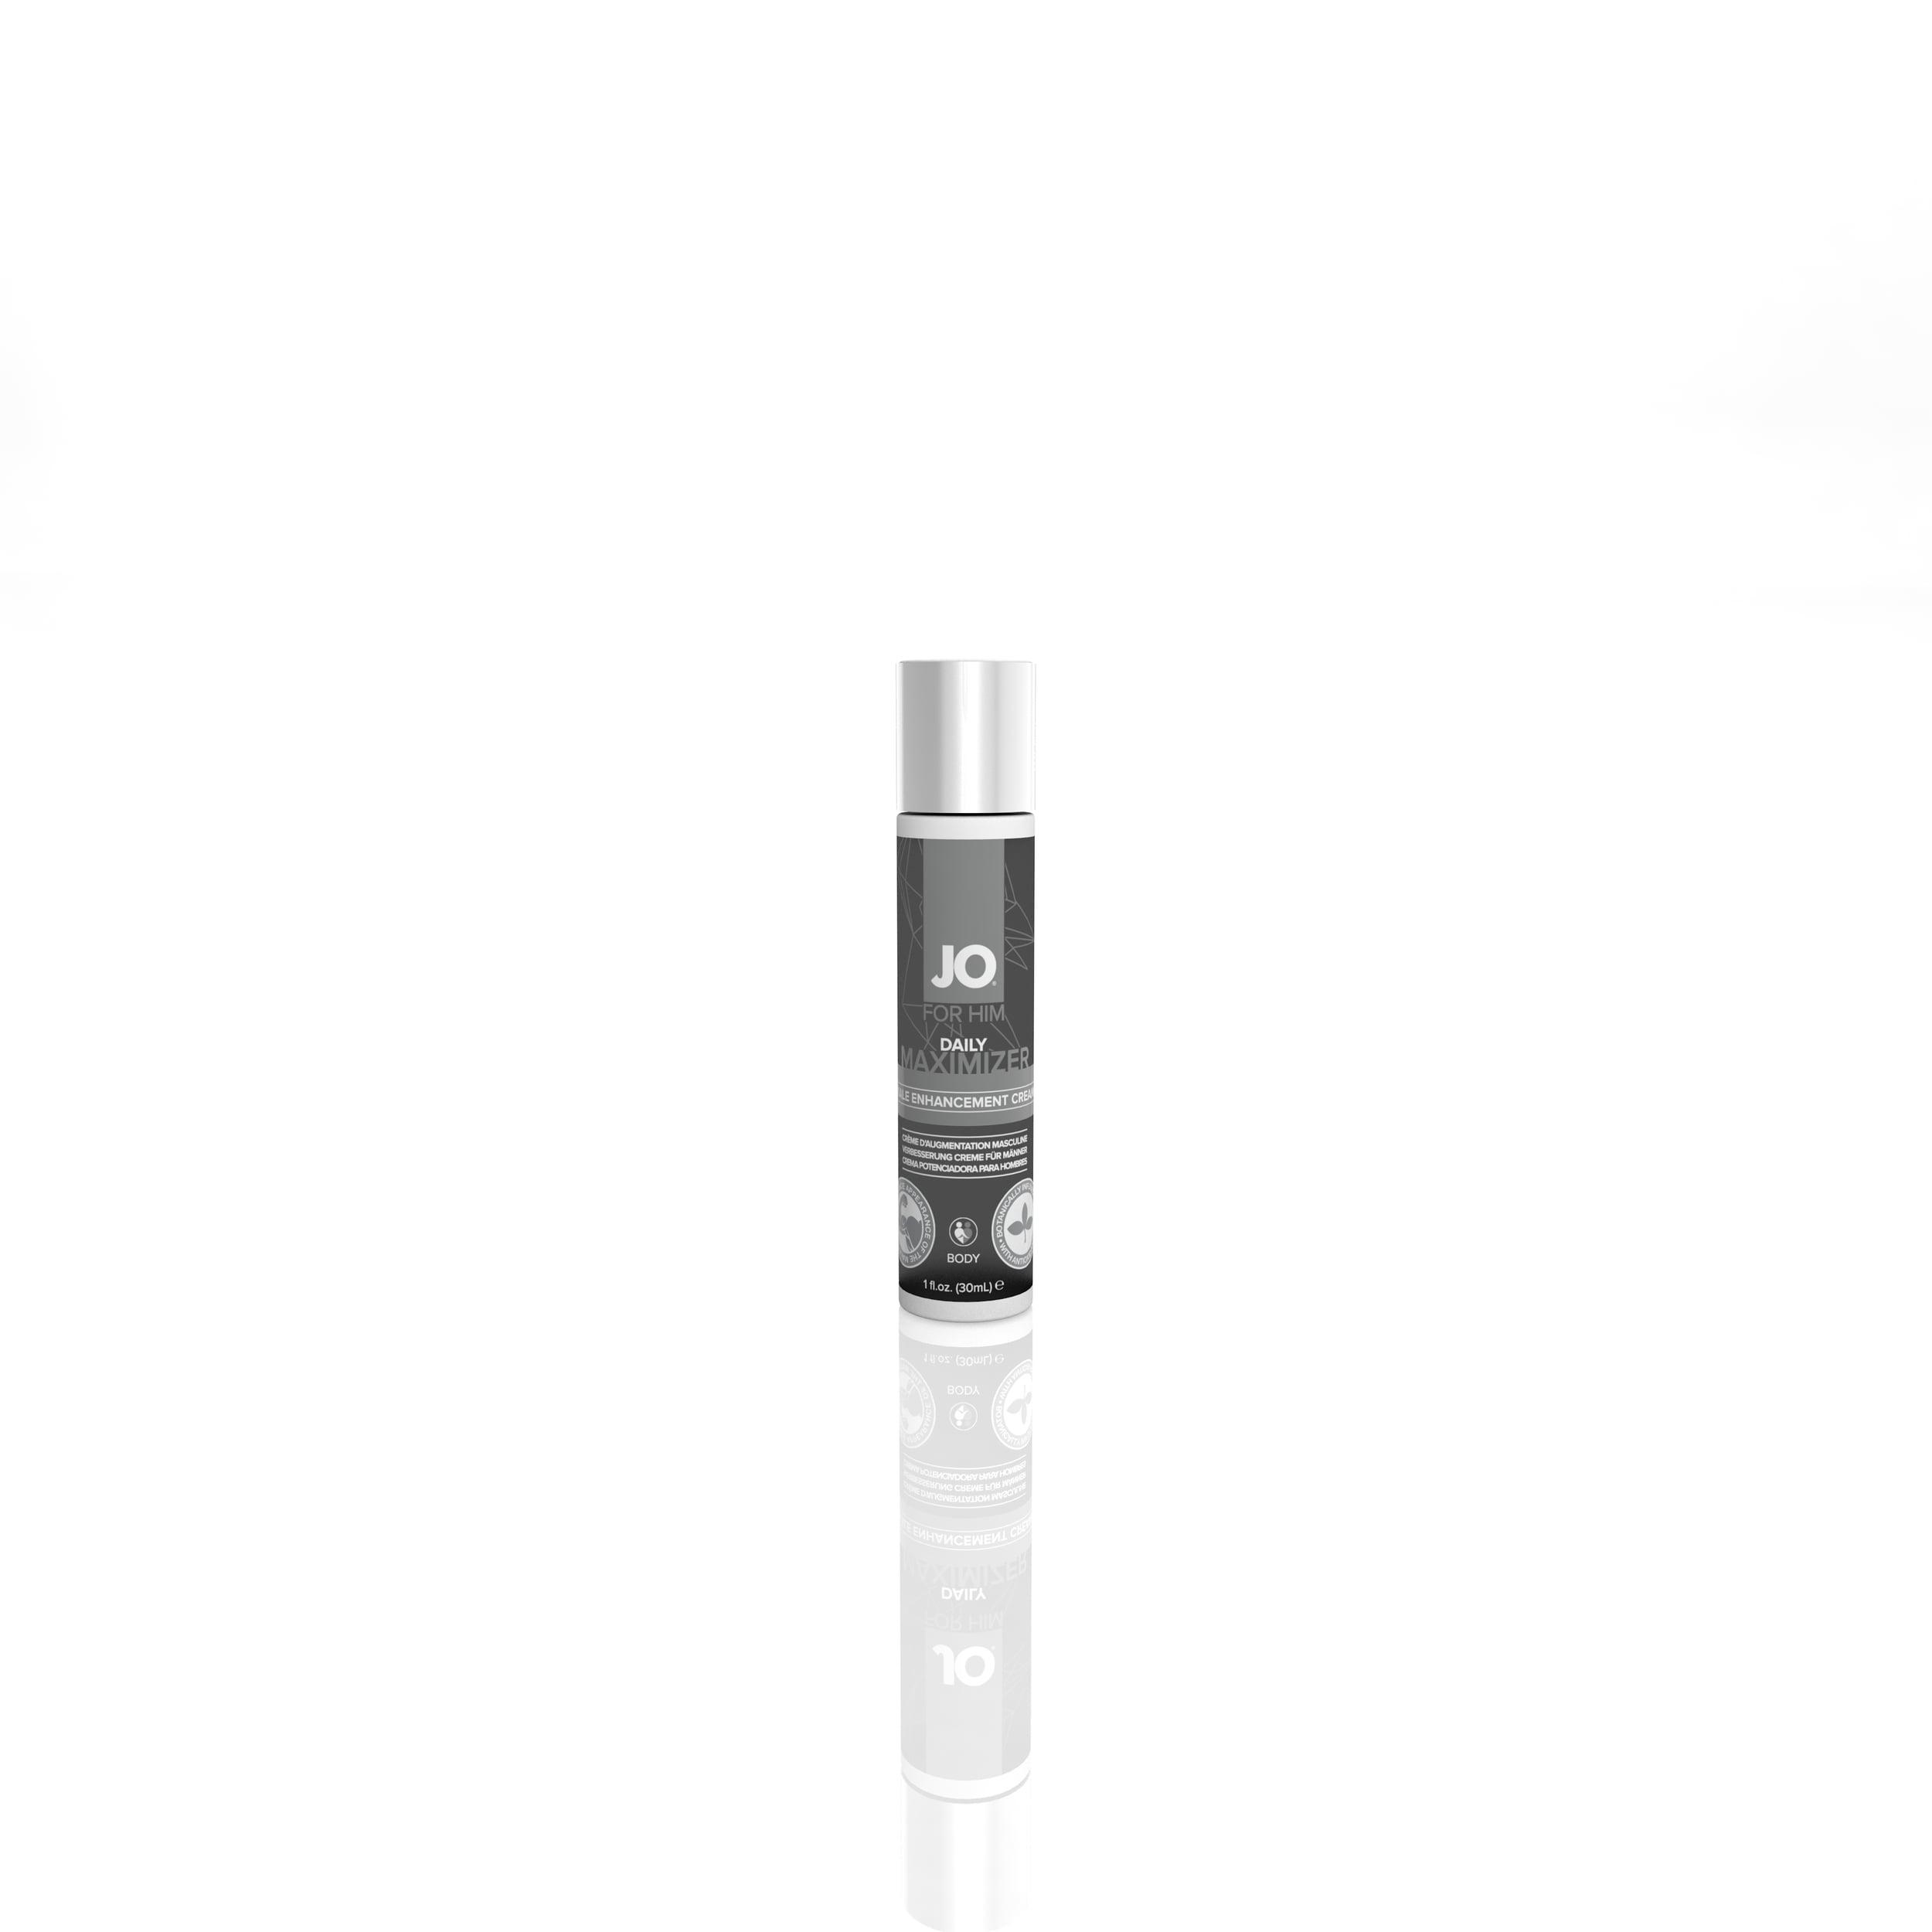 40664 - JO DAILY MAXIMIZER - MALE ENHANCEMENT CREAM - 1fl.oz30mL (bottle only).jpg